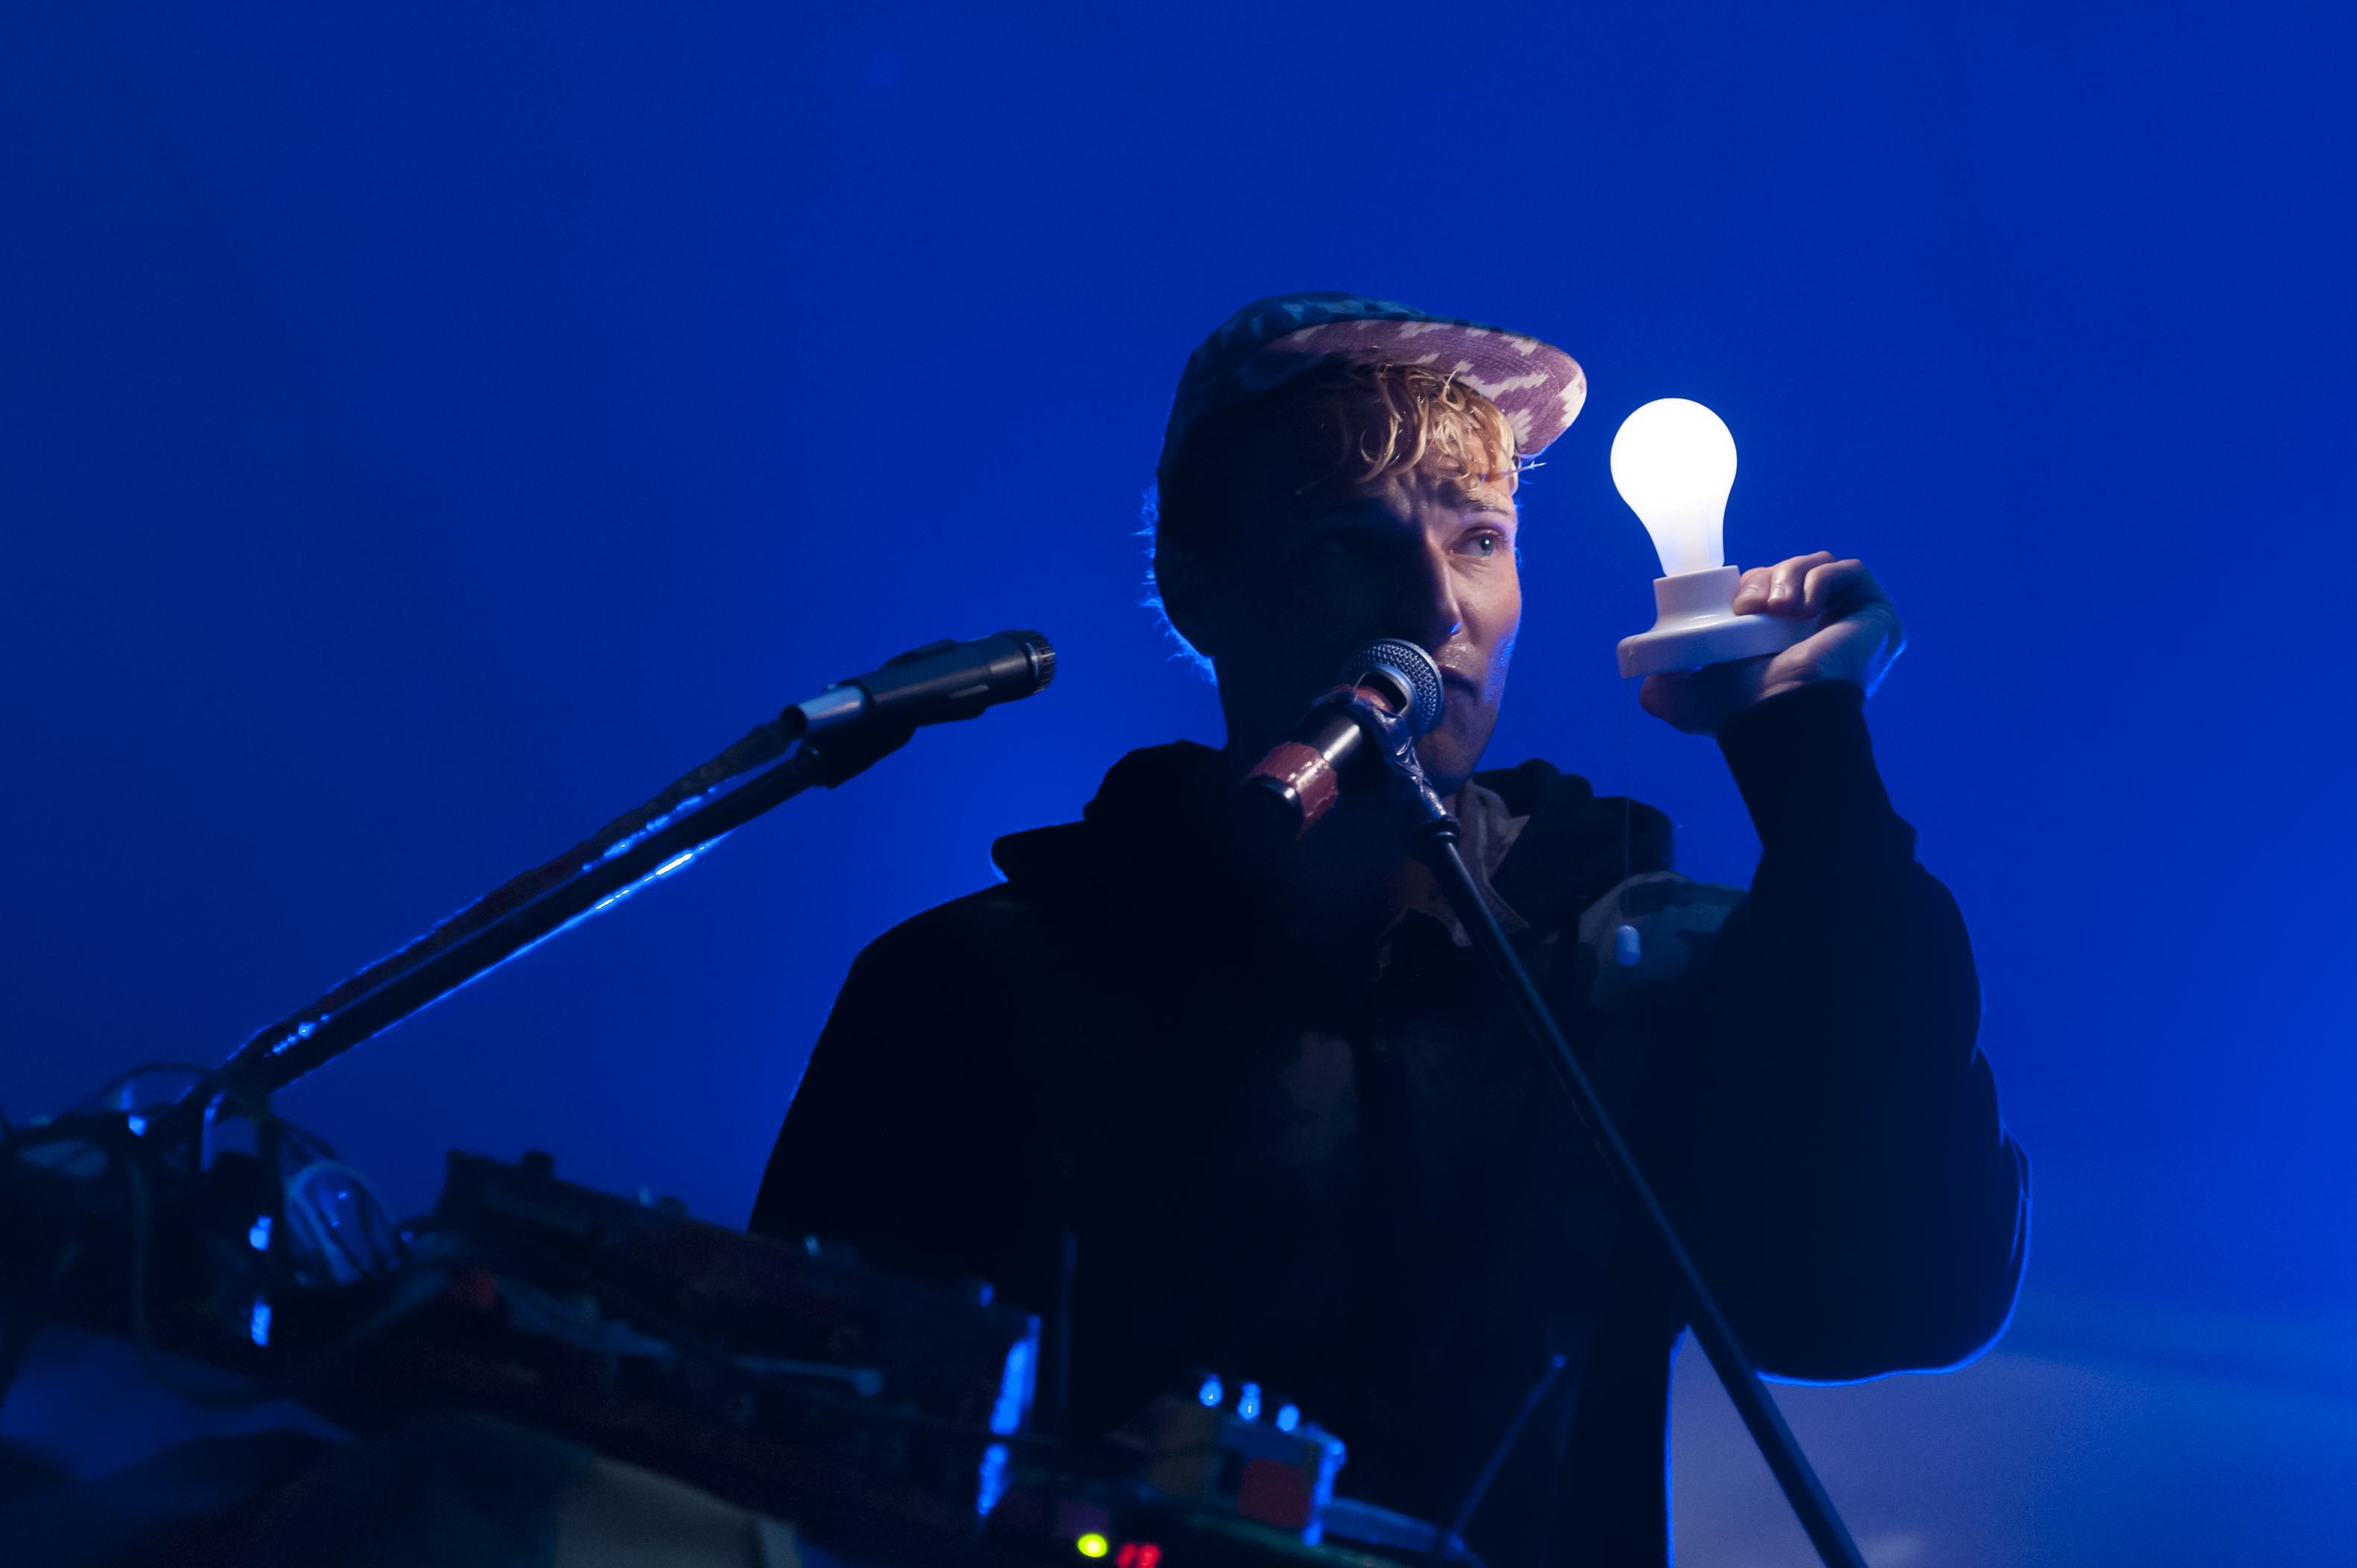 Rich Aucion lit up the stage Saturday night. (photo by Chris Parent)